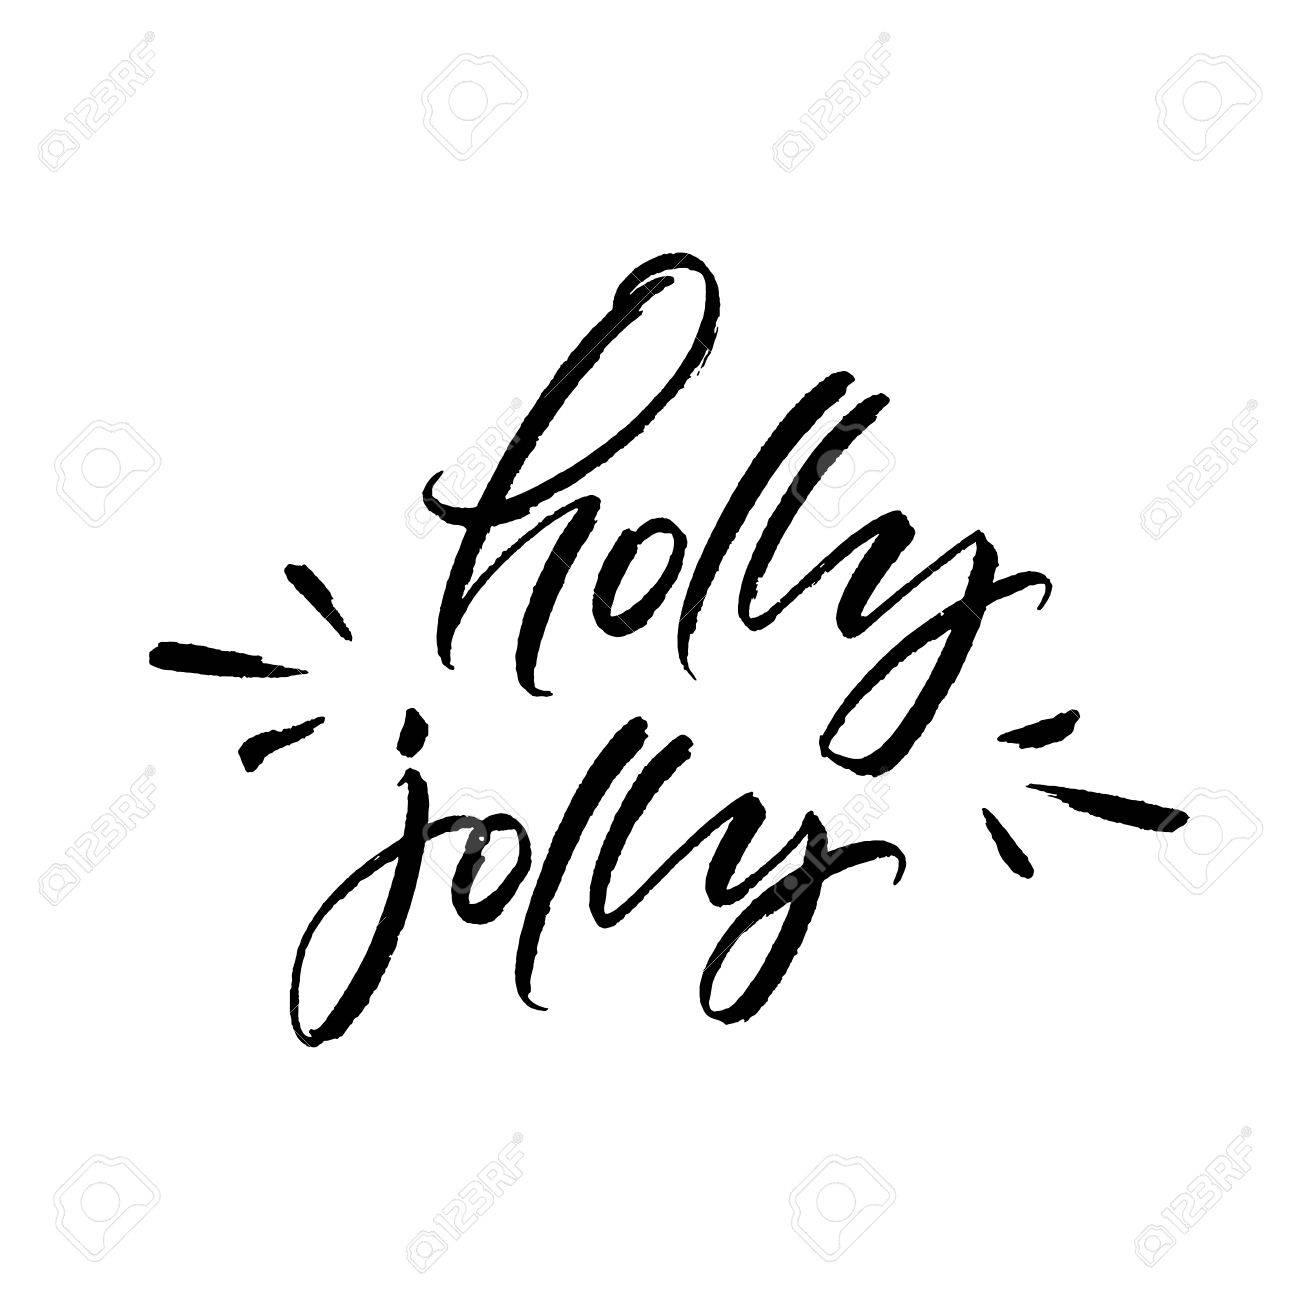 Holly Jolly Christmas Brush Calligraphy Isolated On White Background ...